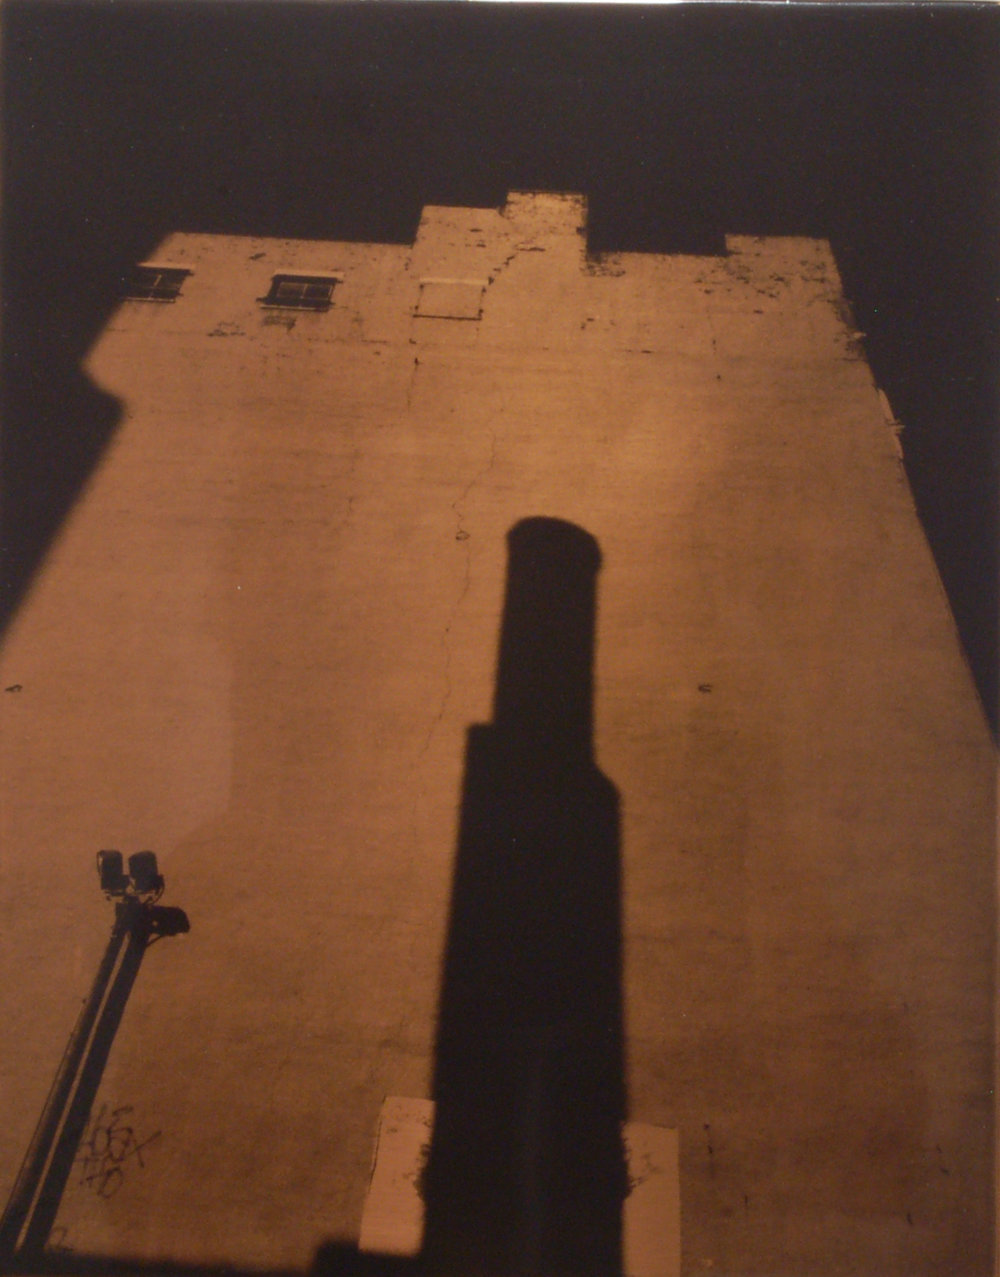 "Carl Goldhagen(BIO), Chimney, 1996, photo emulsion on copper 1/5, 14"" x 11"""